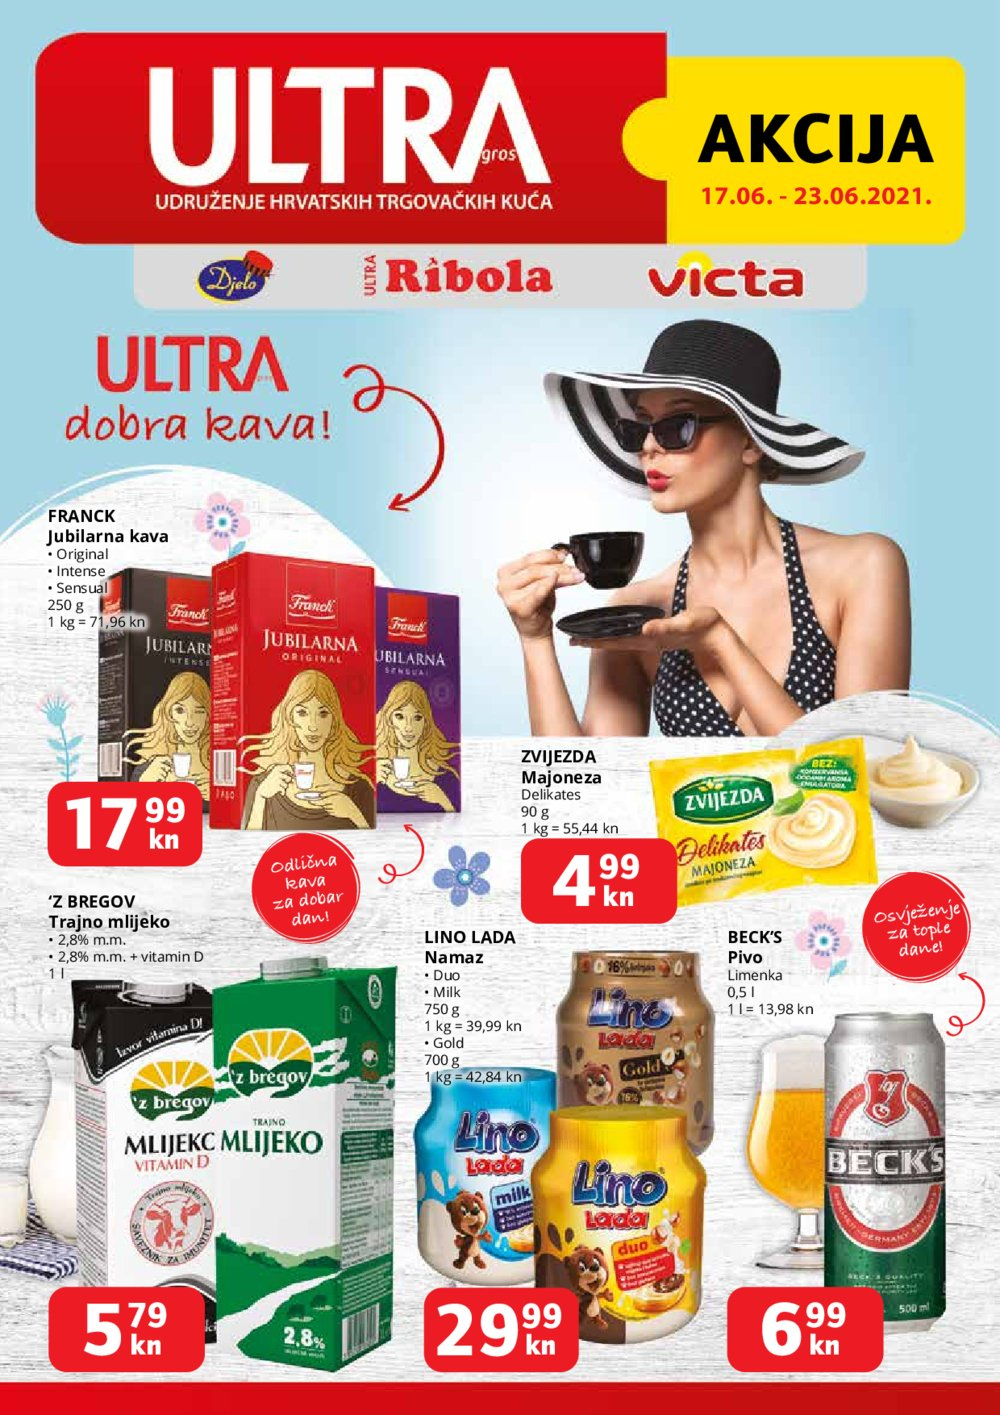 Djelo katalog Ultra Gros Akcija 17.06.-23.06.2021.